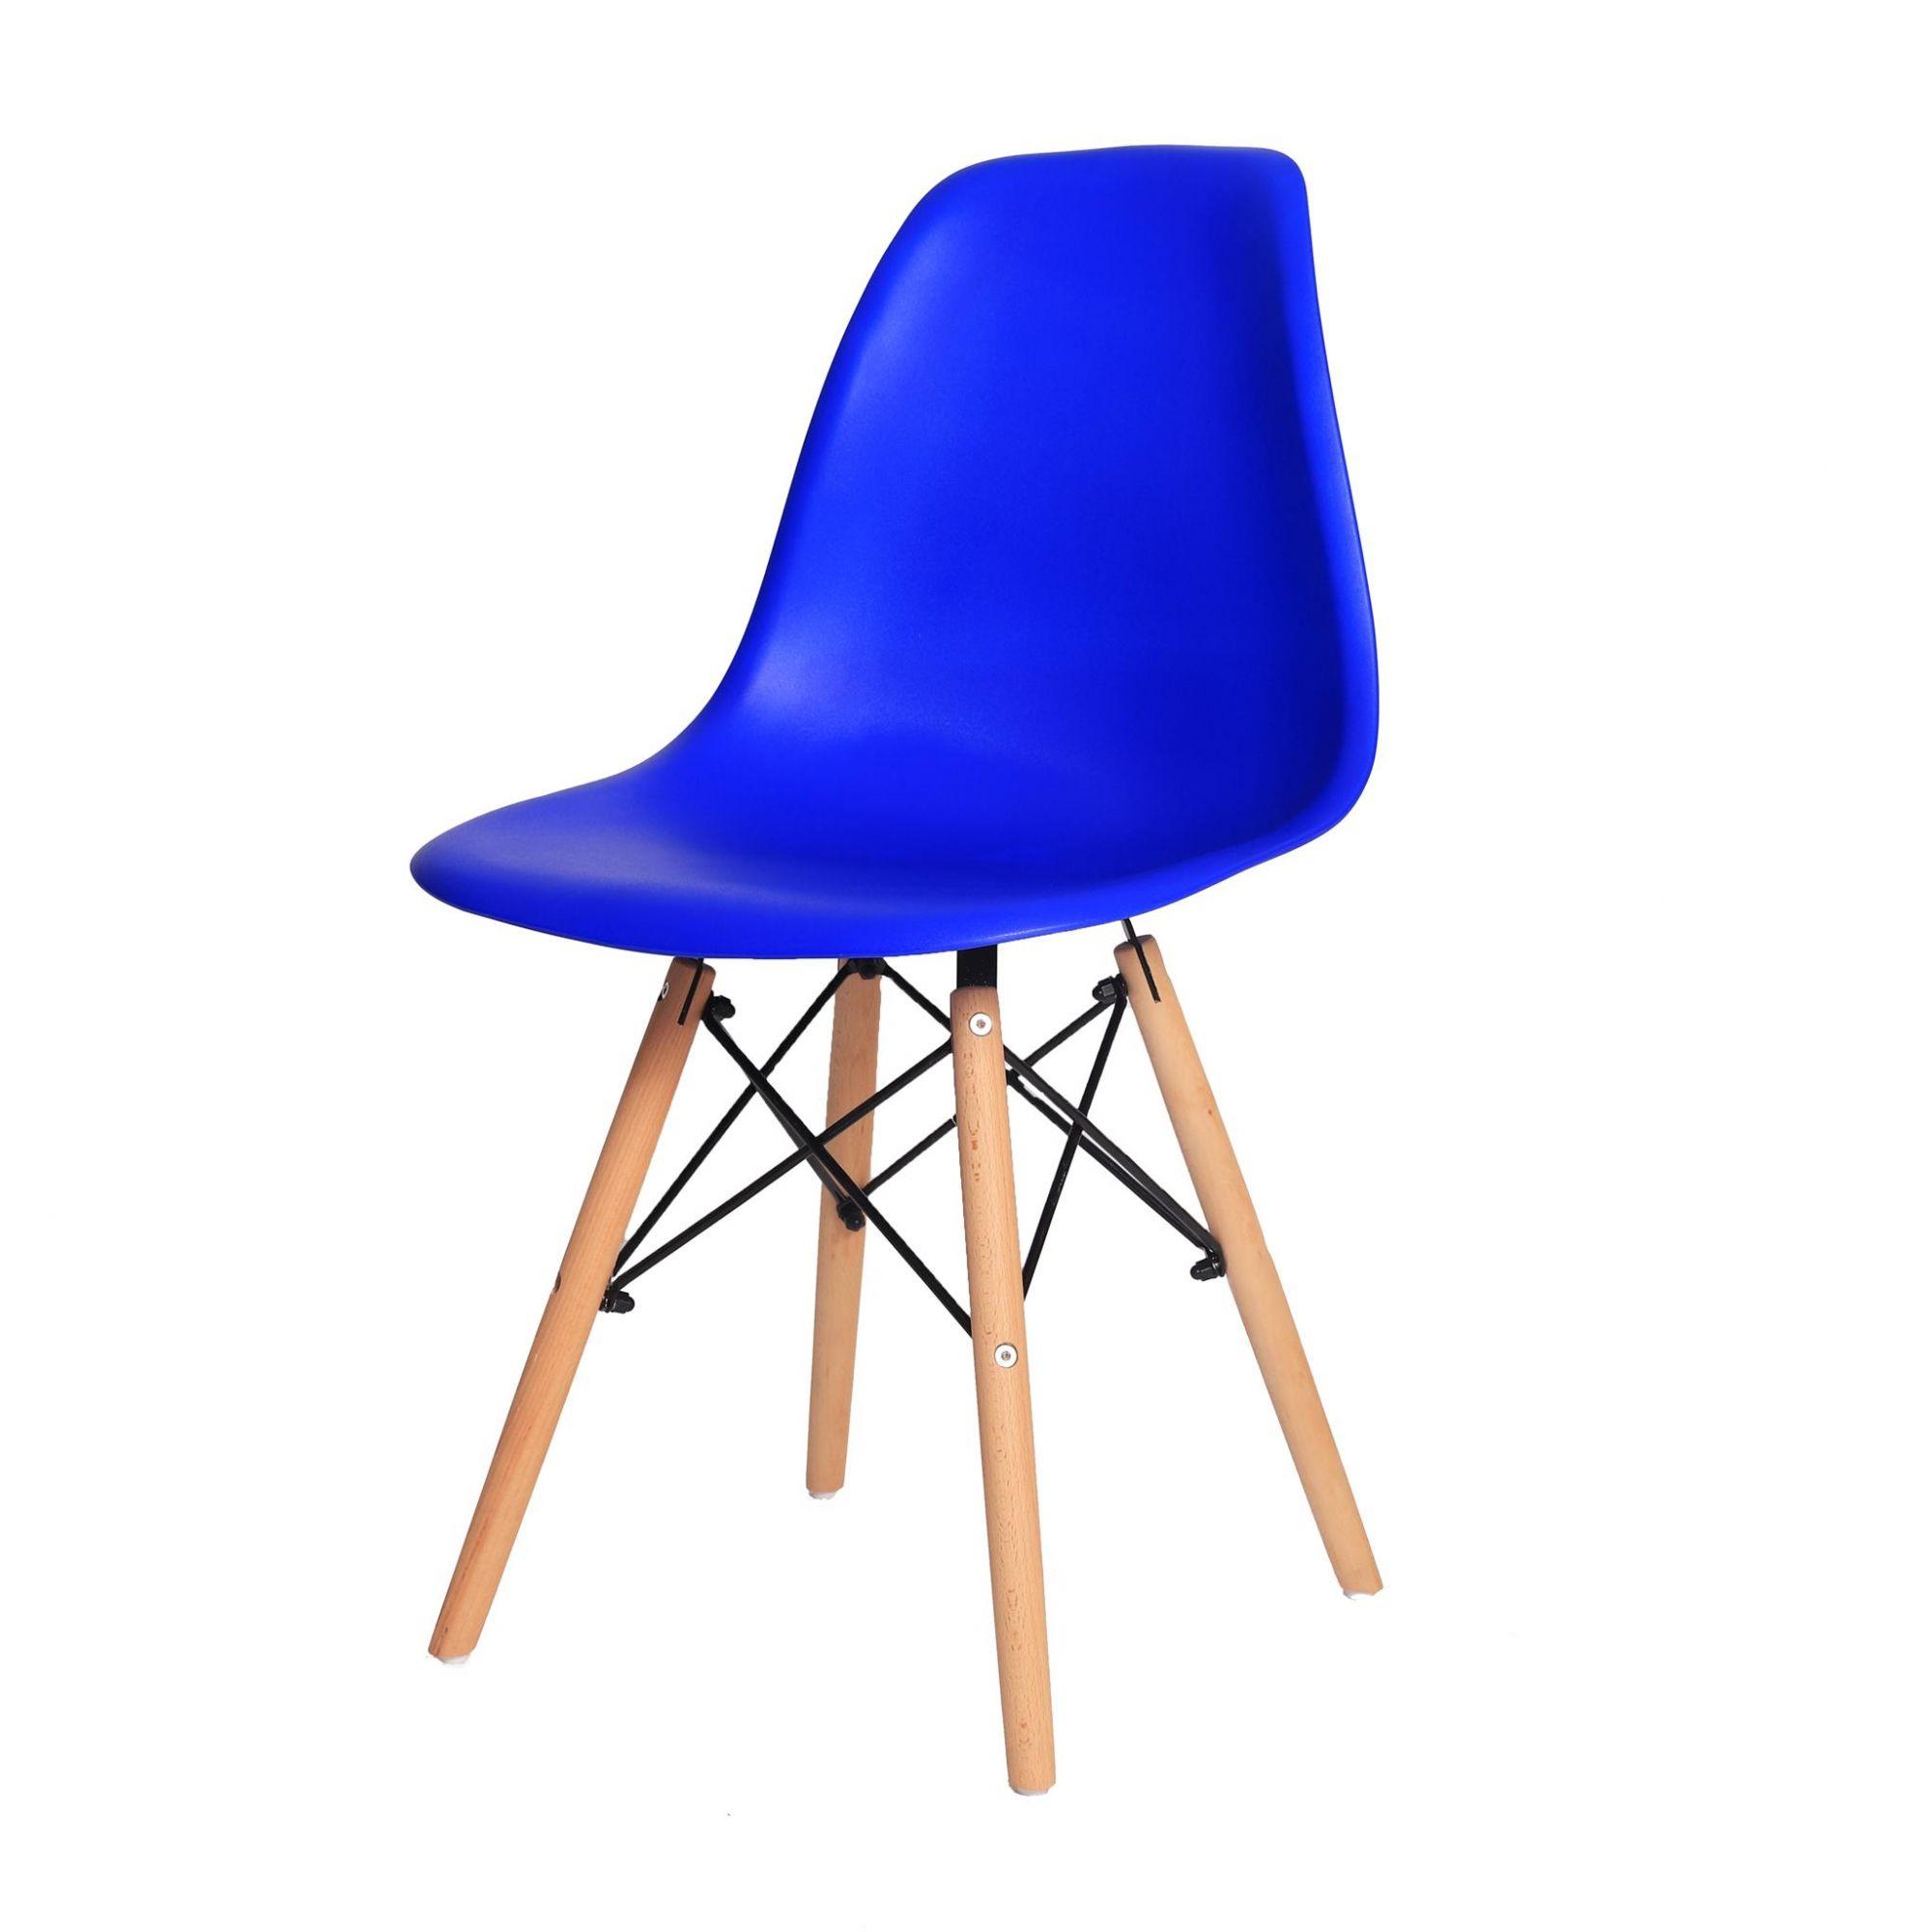 Cadeira De Jantar Charles Eames Eiffel Azul Bic Base De Madeira